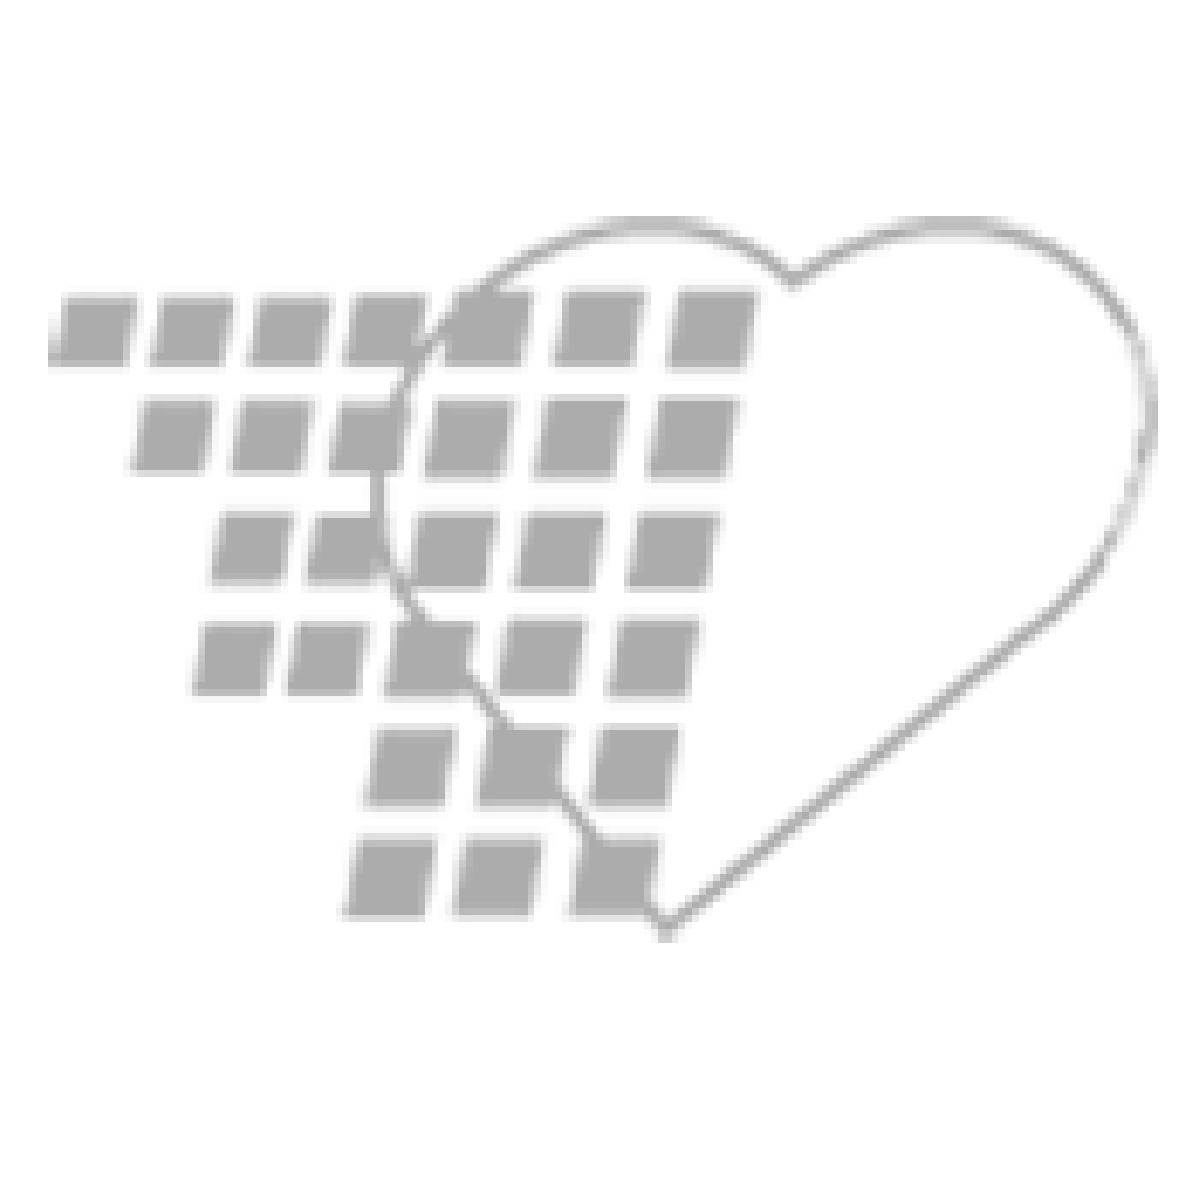 07-07-6101 Laerdal LCSU® 4, 300 mL Suction Unit